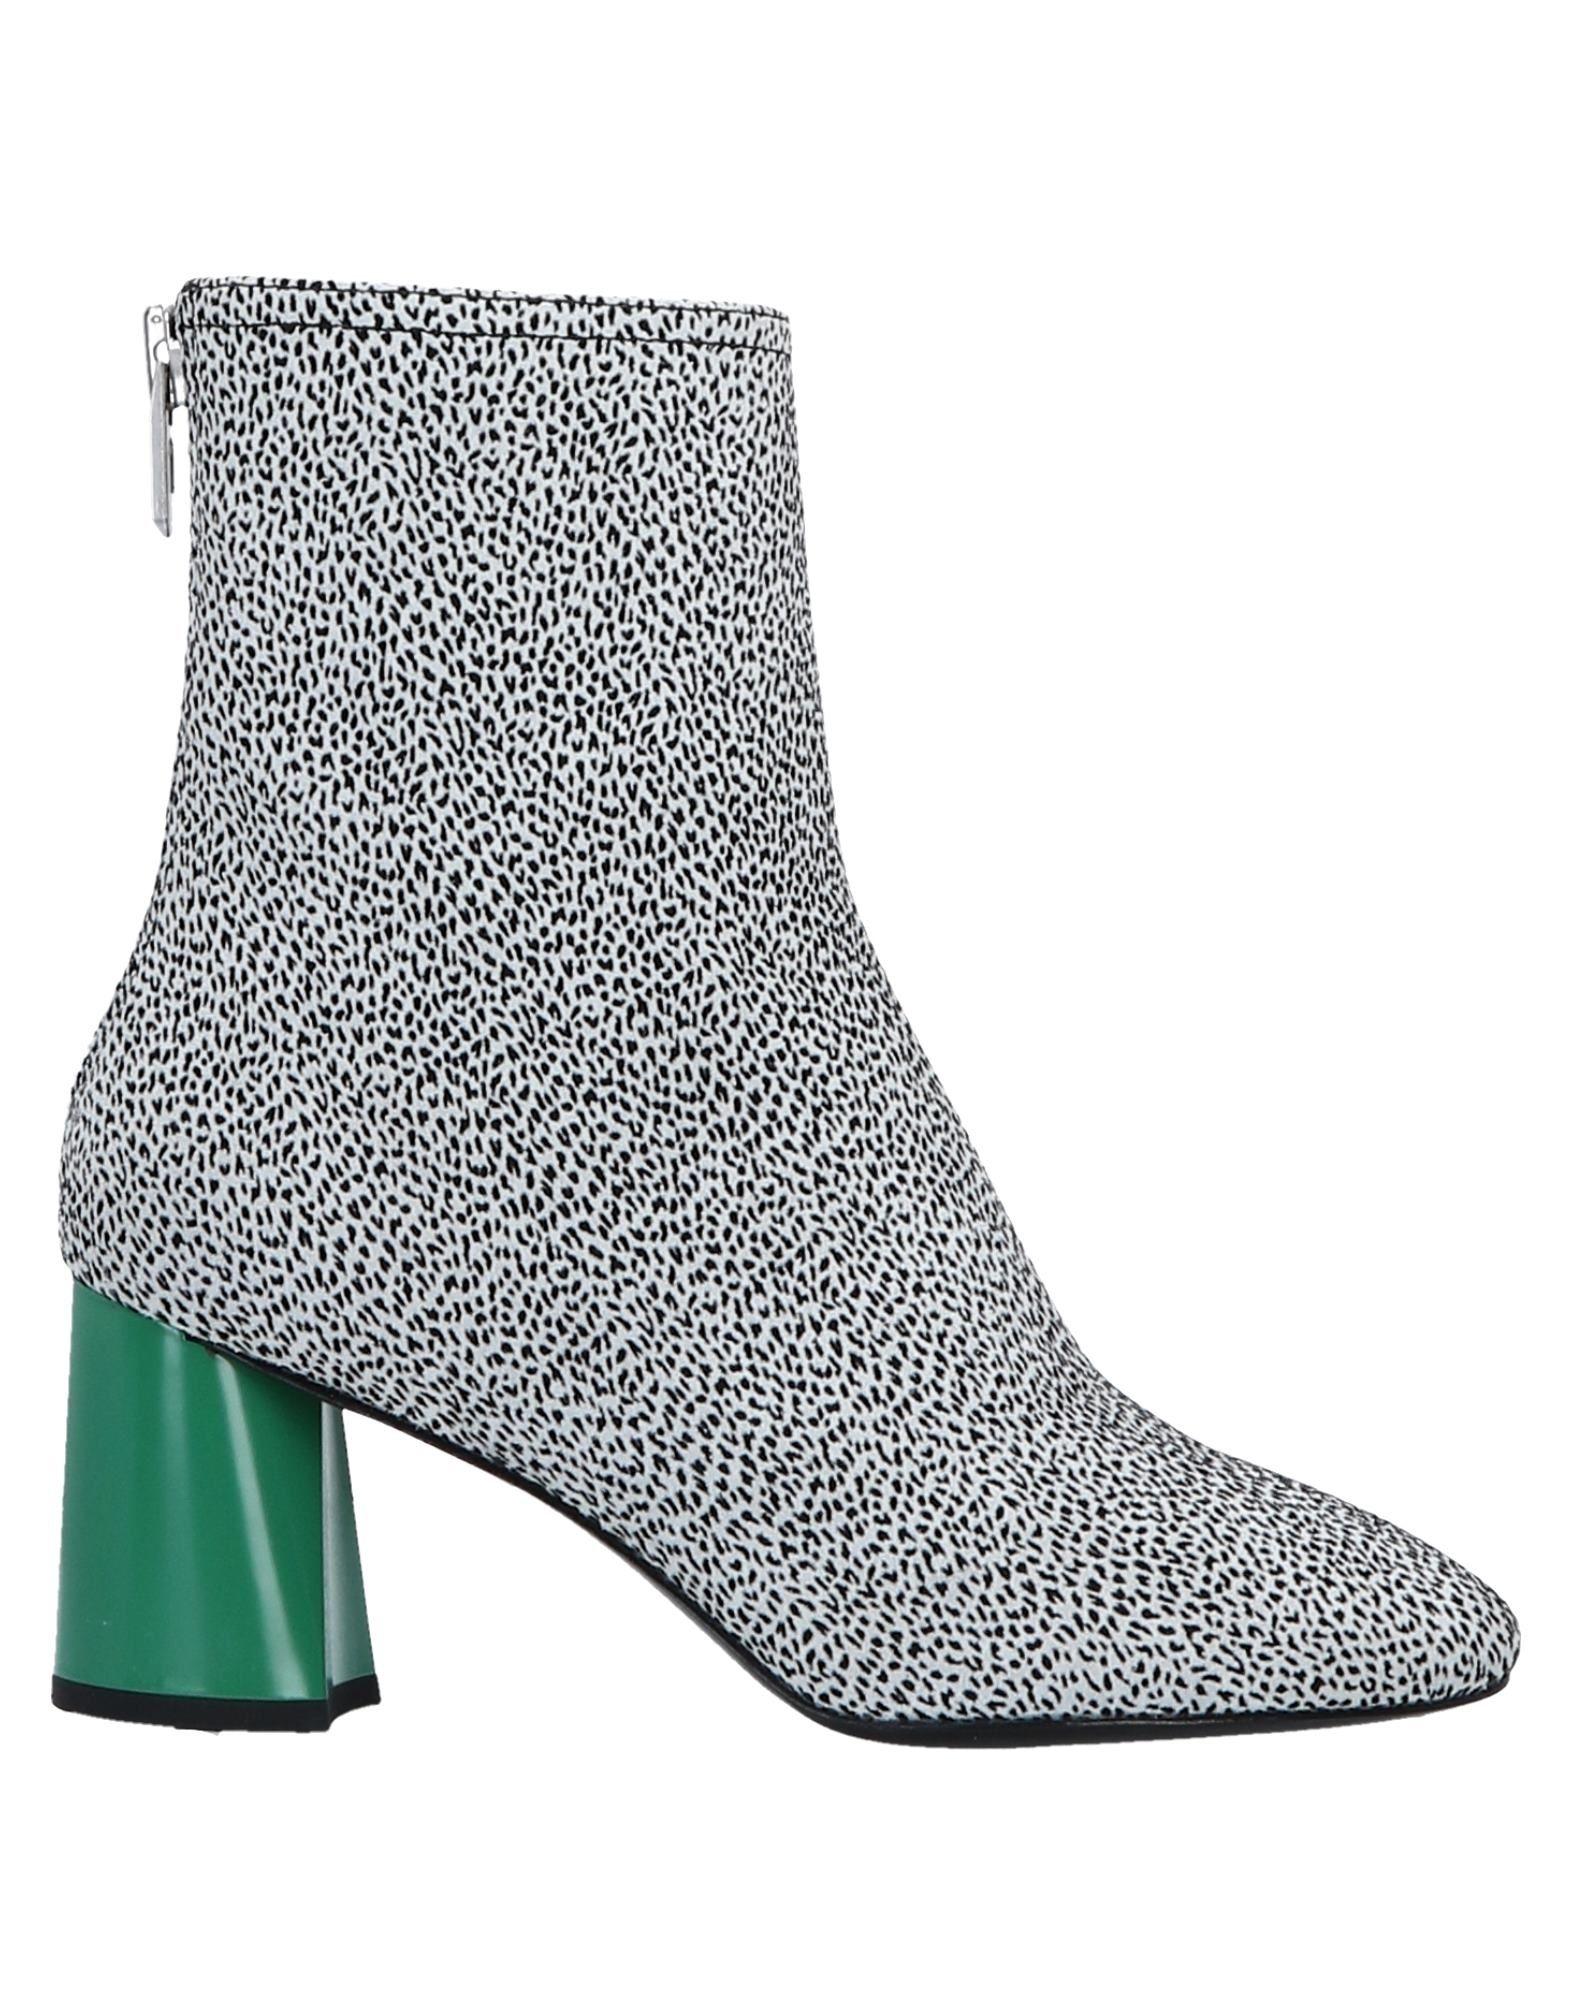 3.1 Phillip Lim Ankle Boot - Women 3.1 Phillip Lim  Ankle Boots online on  Lim United Kingdom - 11515347SL 010276